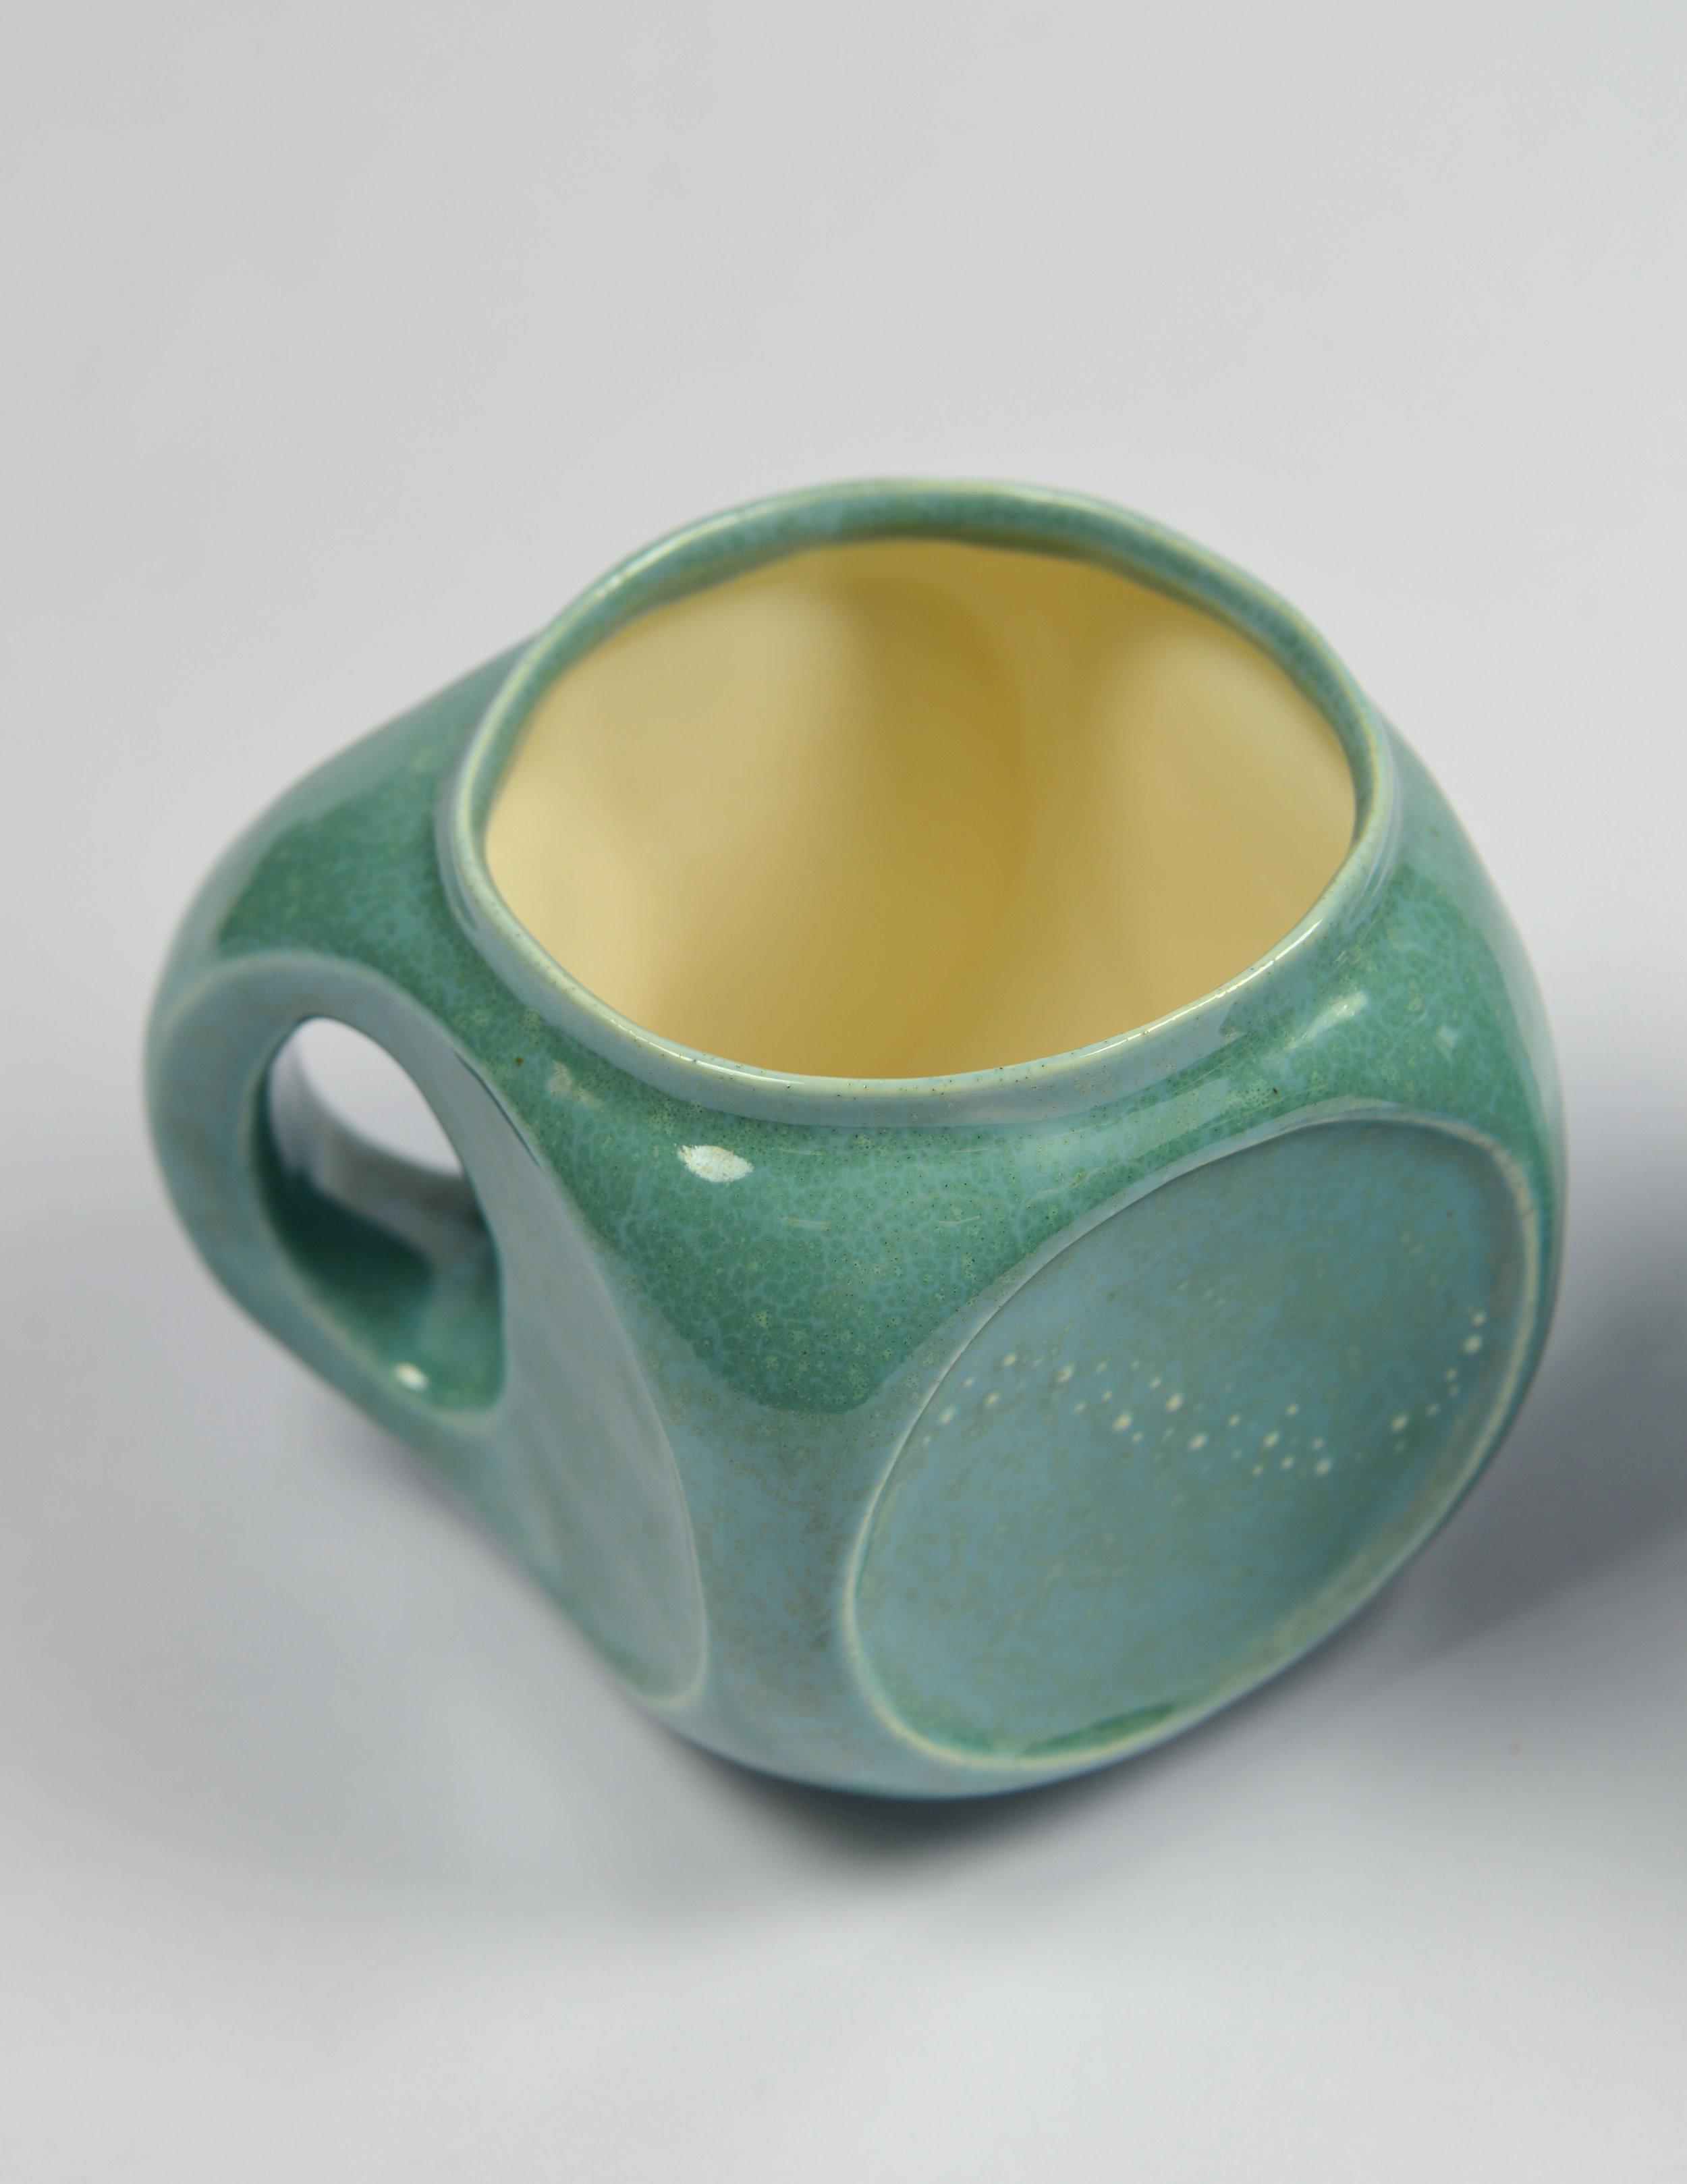 Geometric Cup (2017)